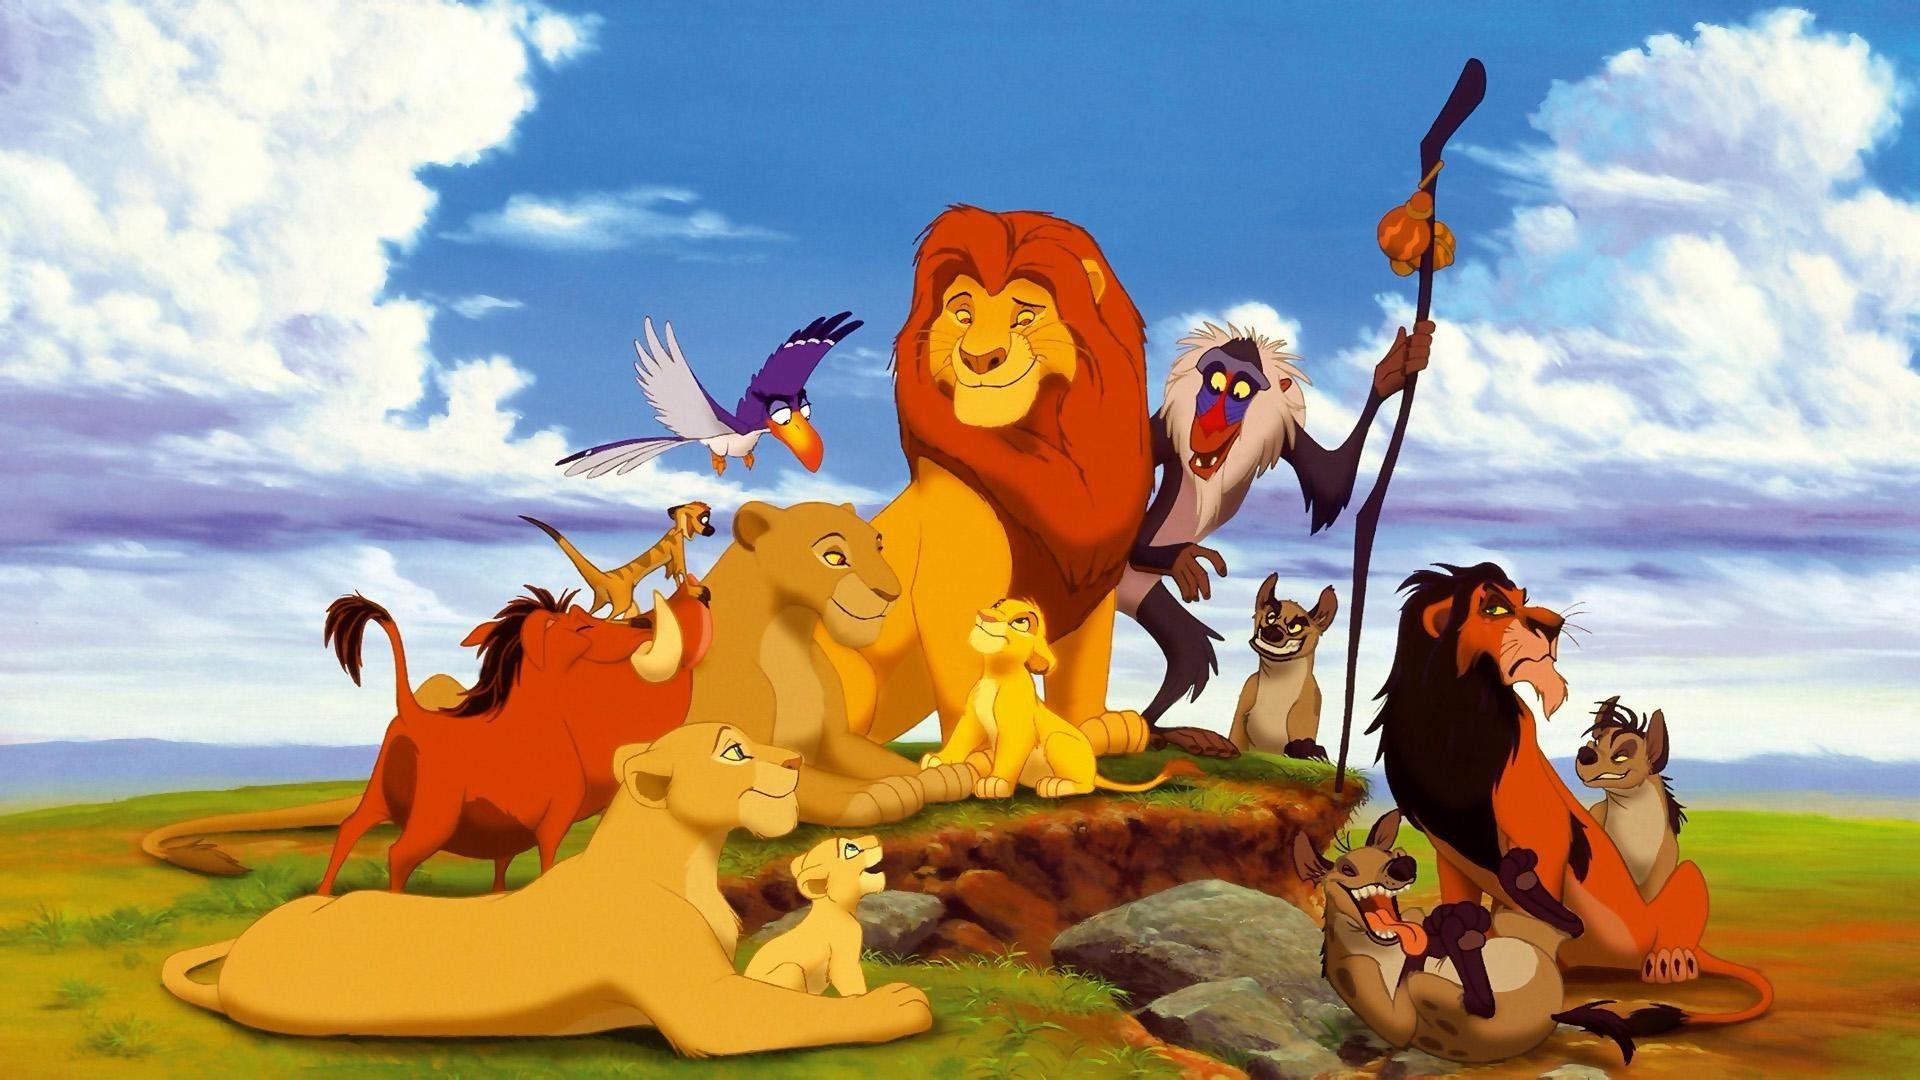 lion king images free download